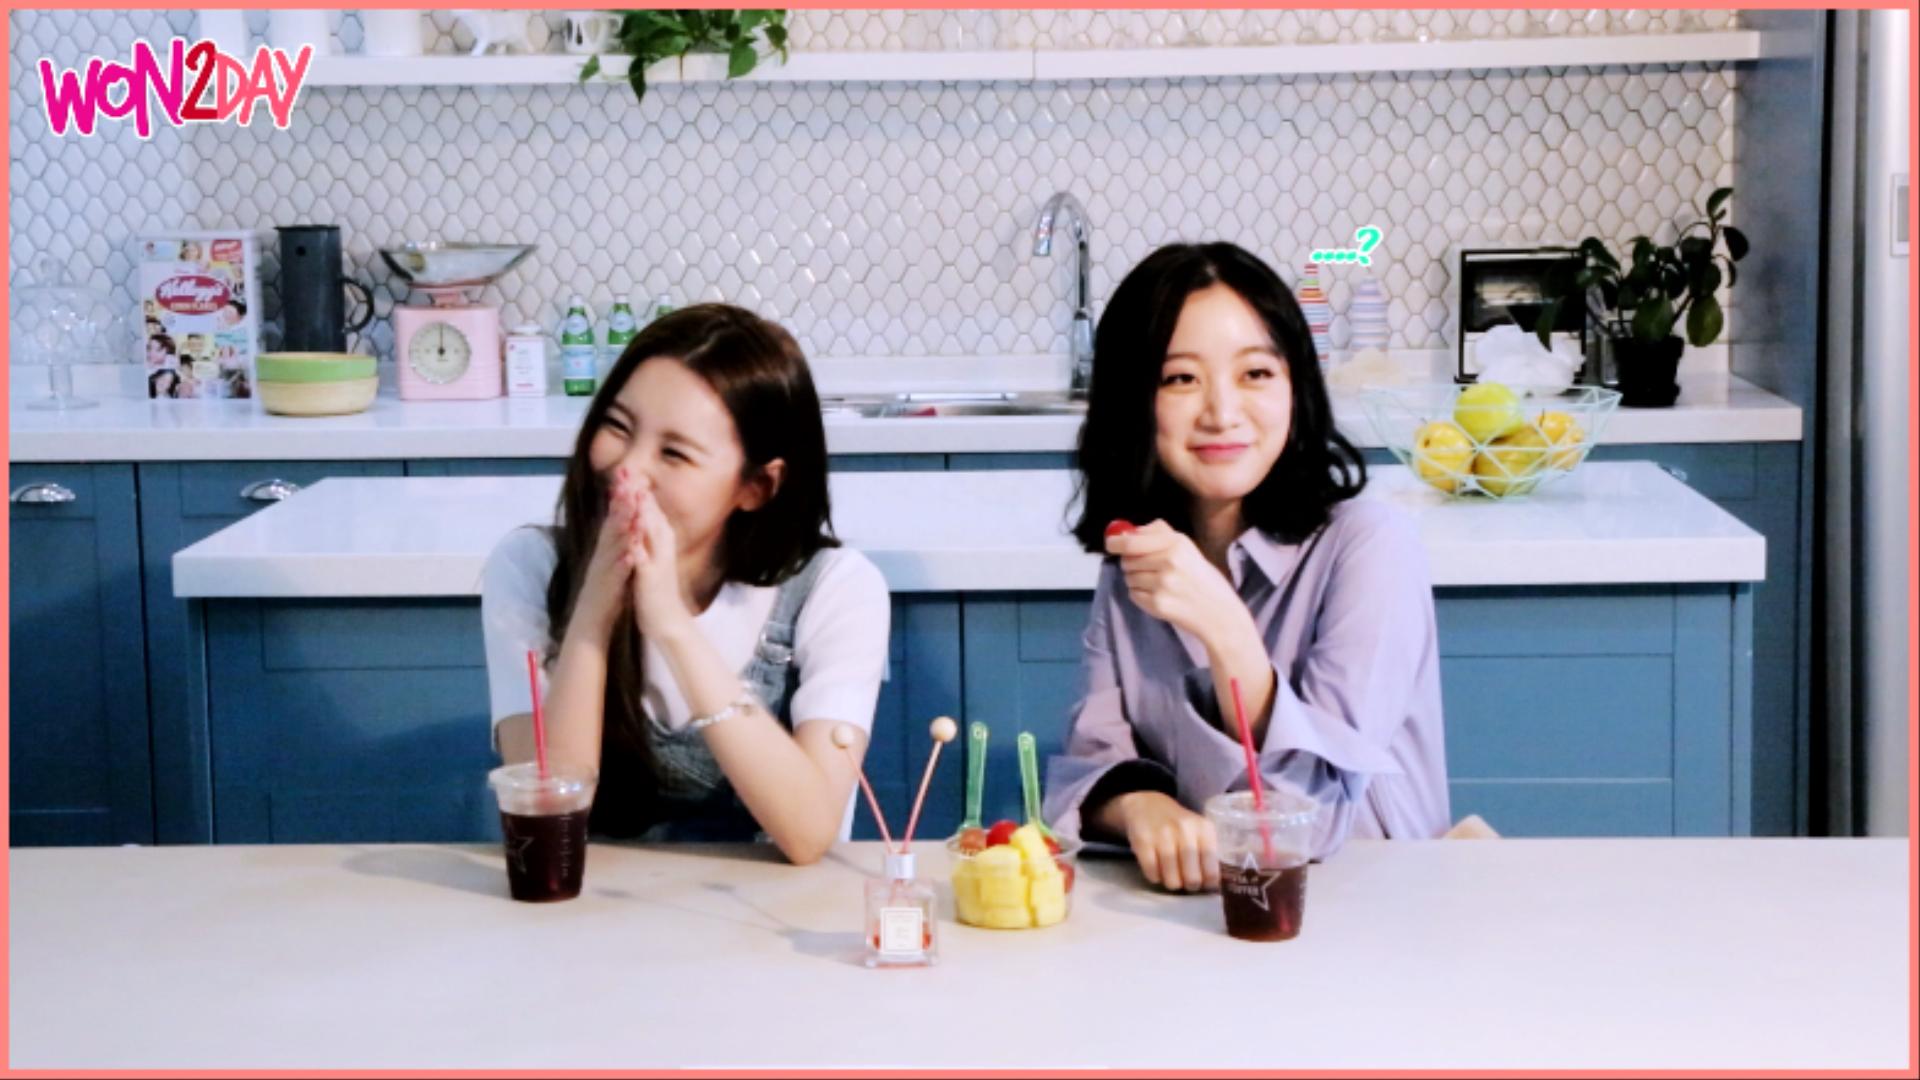 [WON2DAY] 04 선미&혜림 - 요리